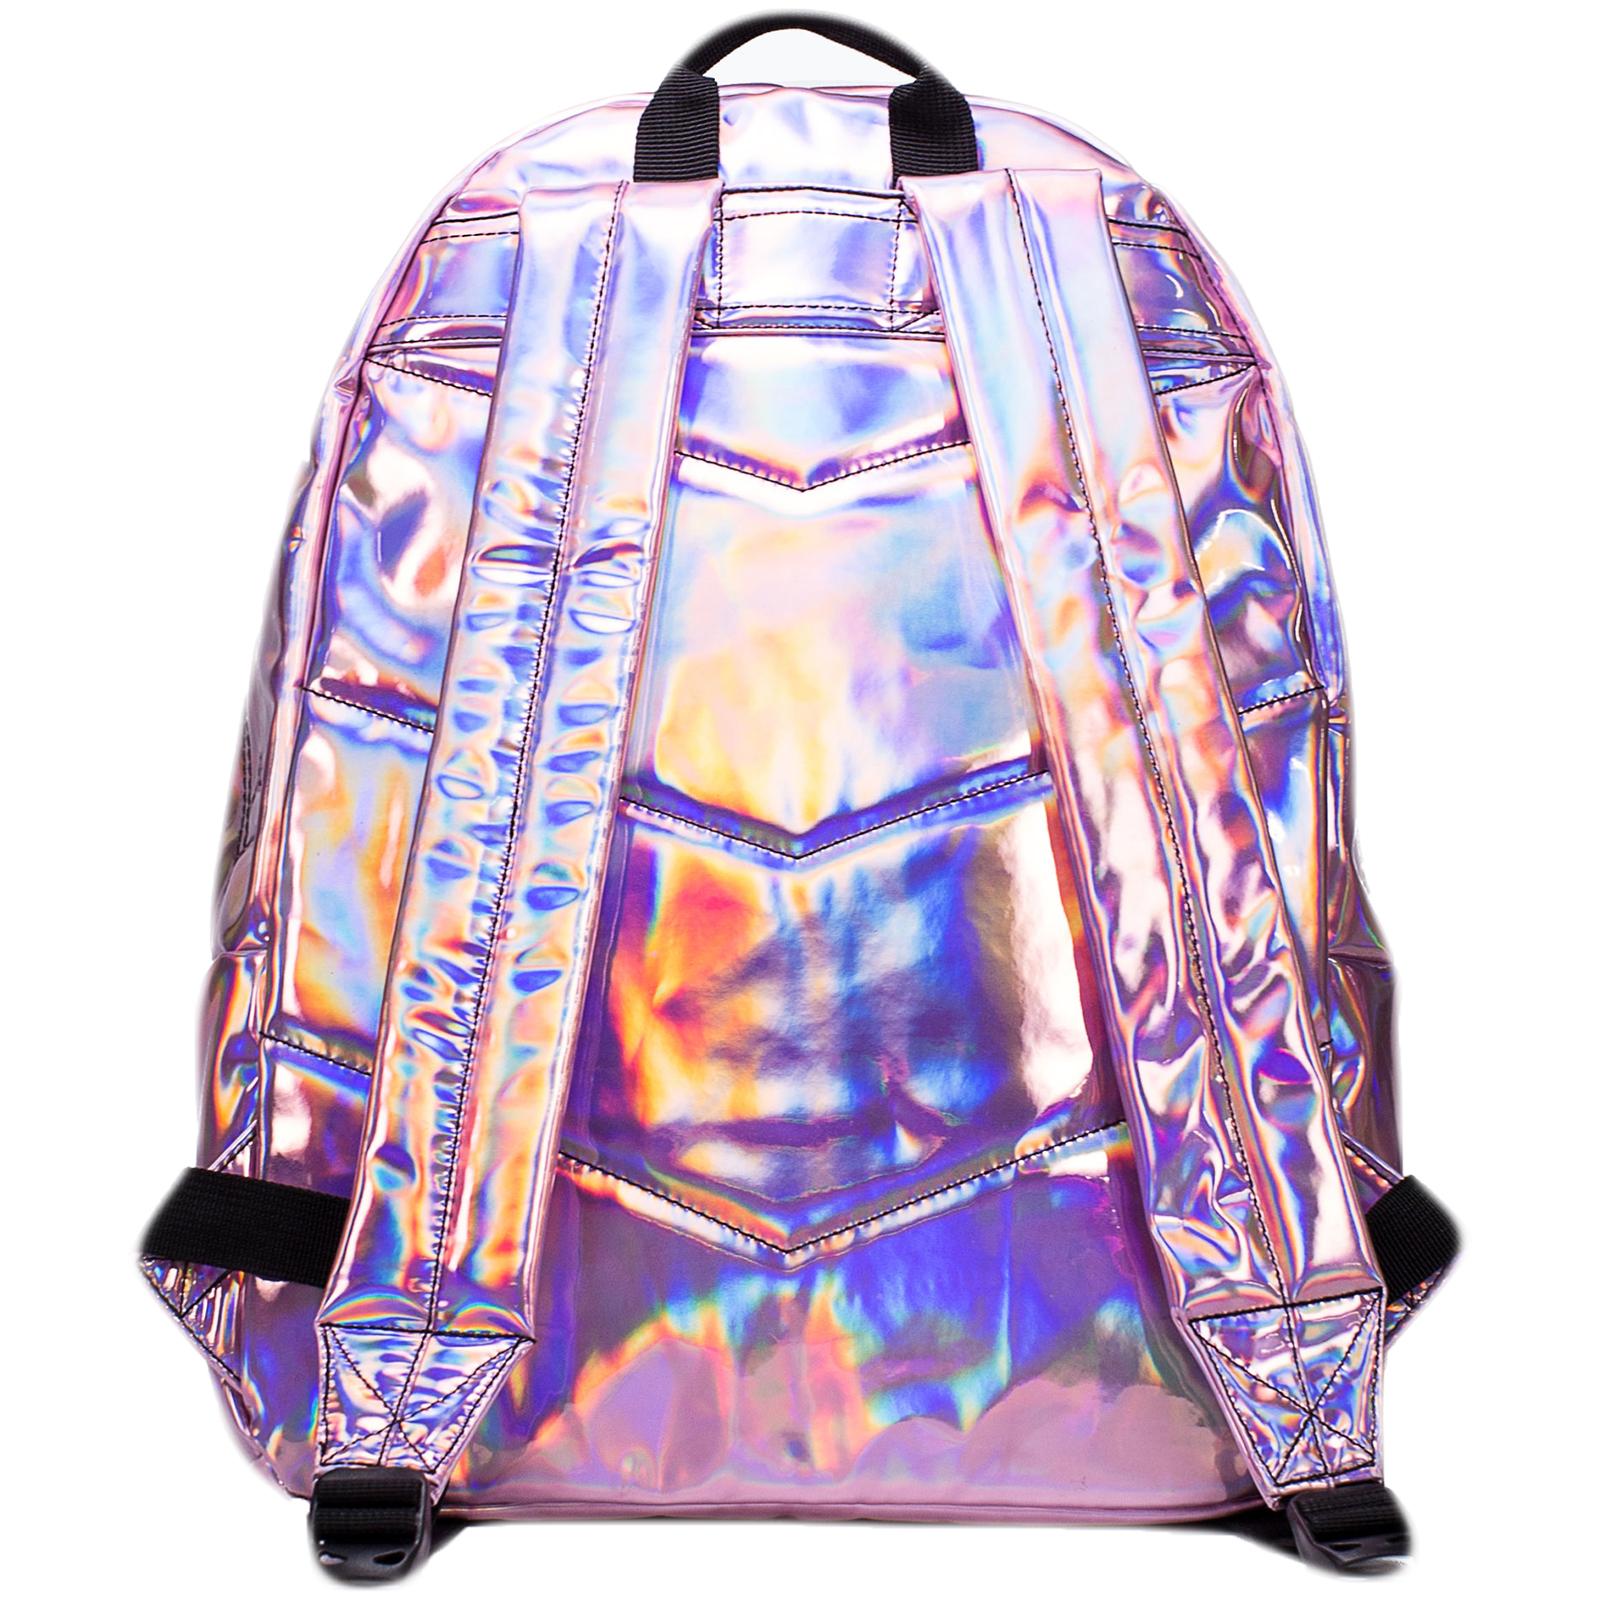 Unisexe-Hype-Sac-A-Dos-Ecole-Gym-SACS-pochettes-pencil-case miniature 135